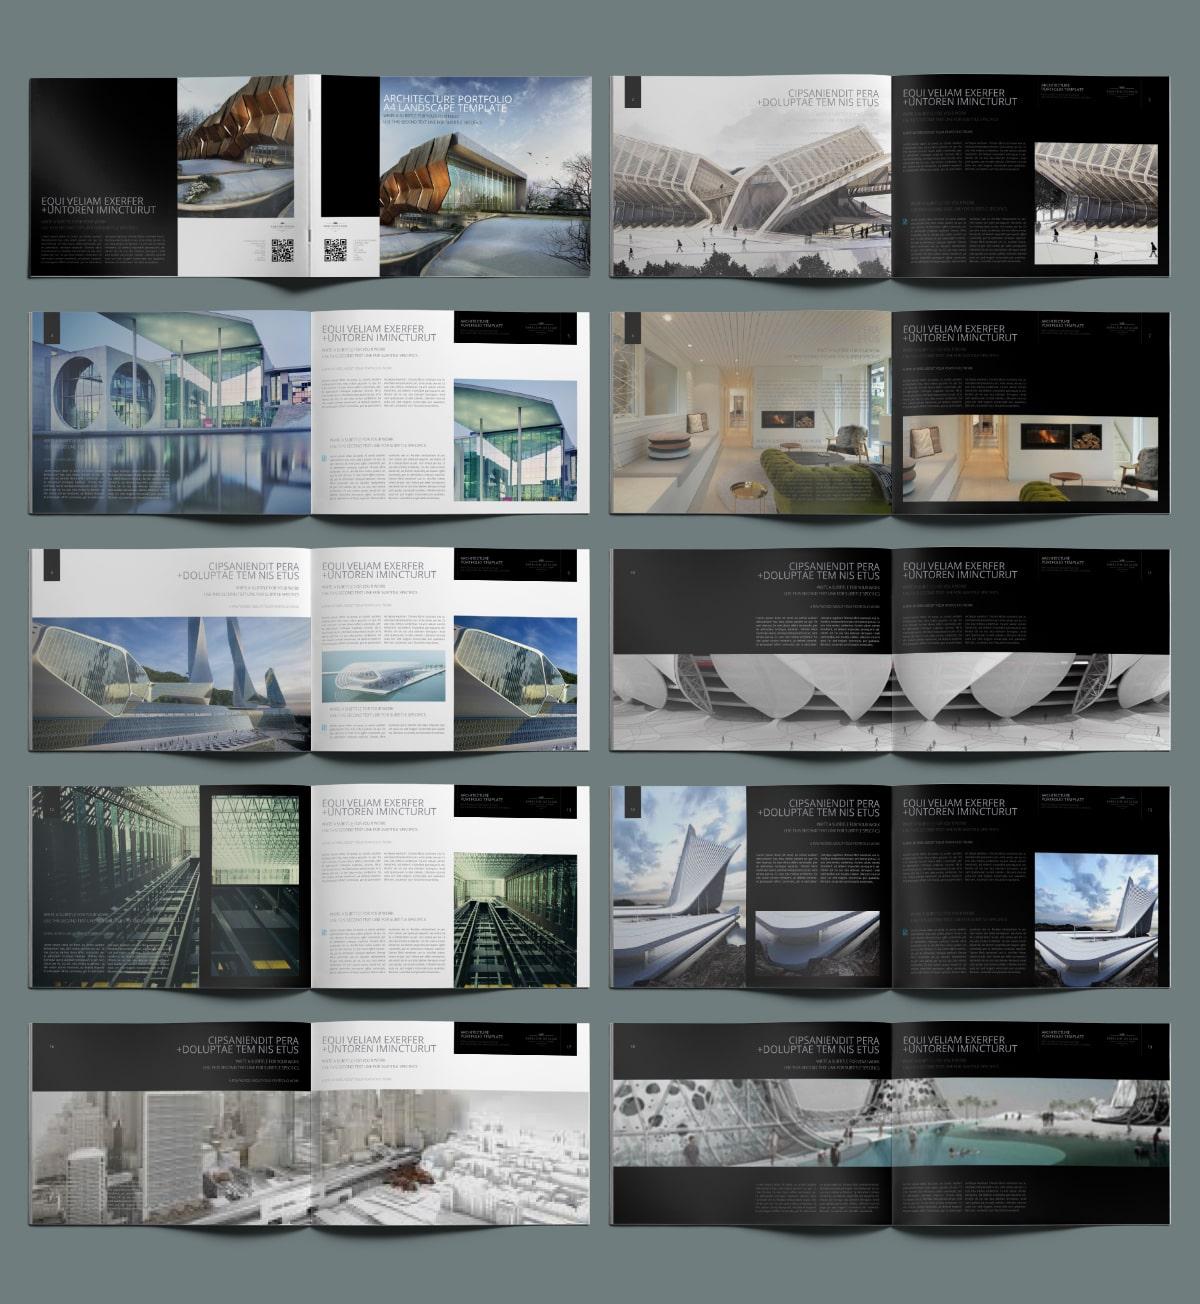 Architecture Portfolio A4 Landscape Template - Layouts